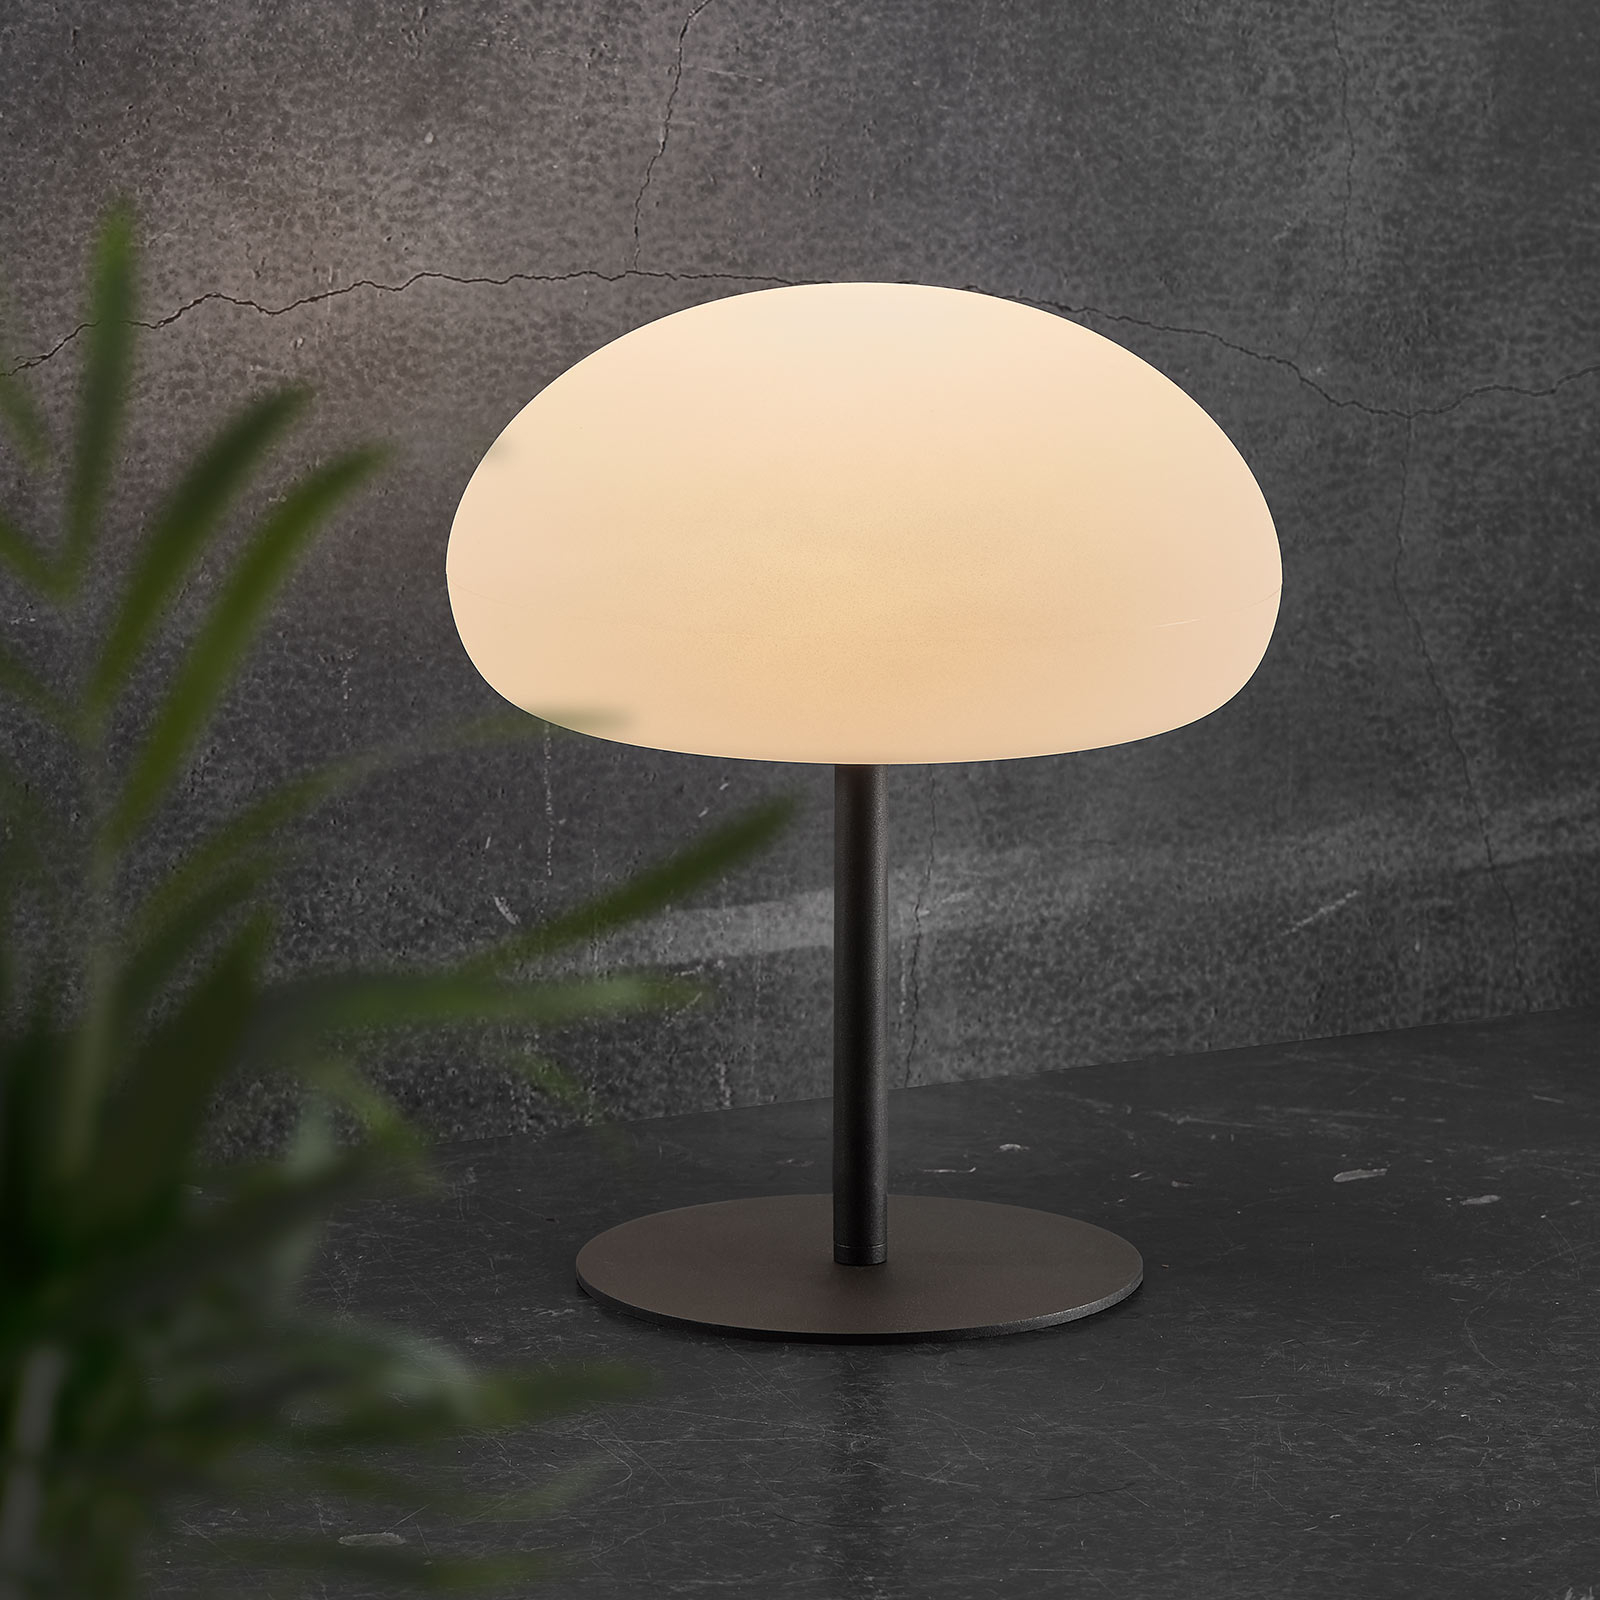 LED-bordslampa Sponge table batteri 40,5 cm hög